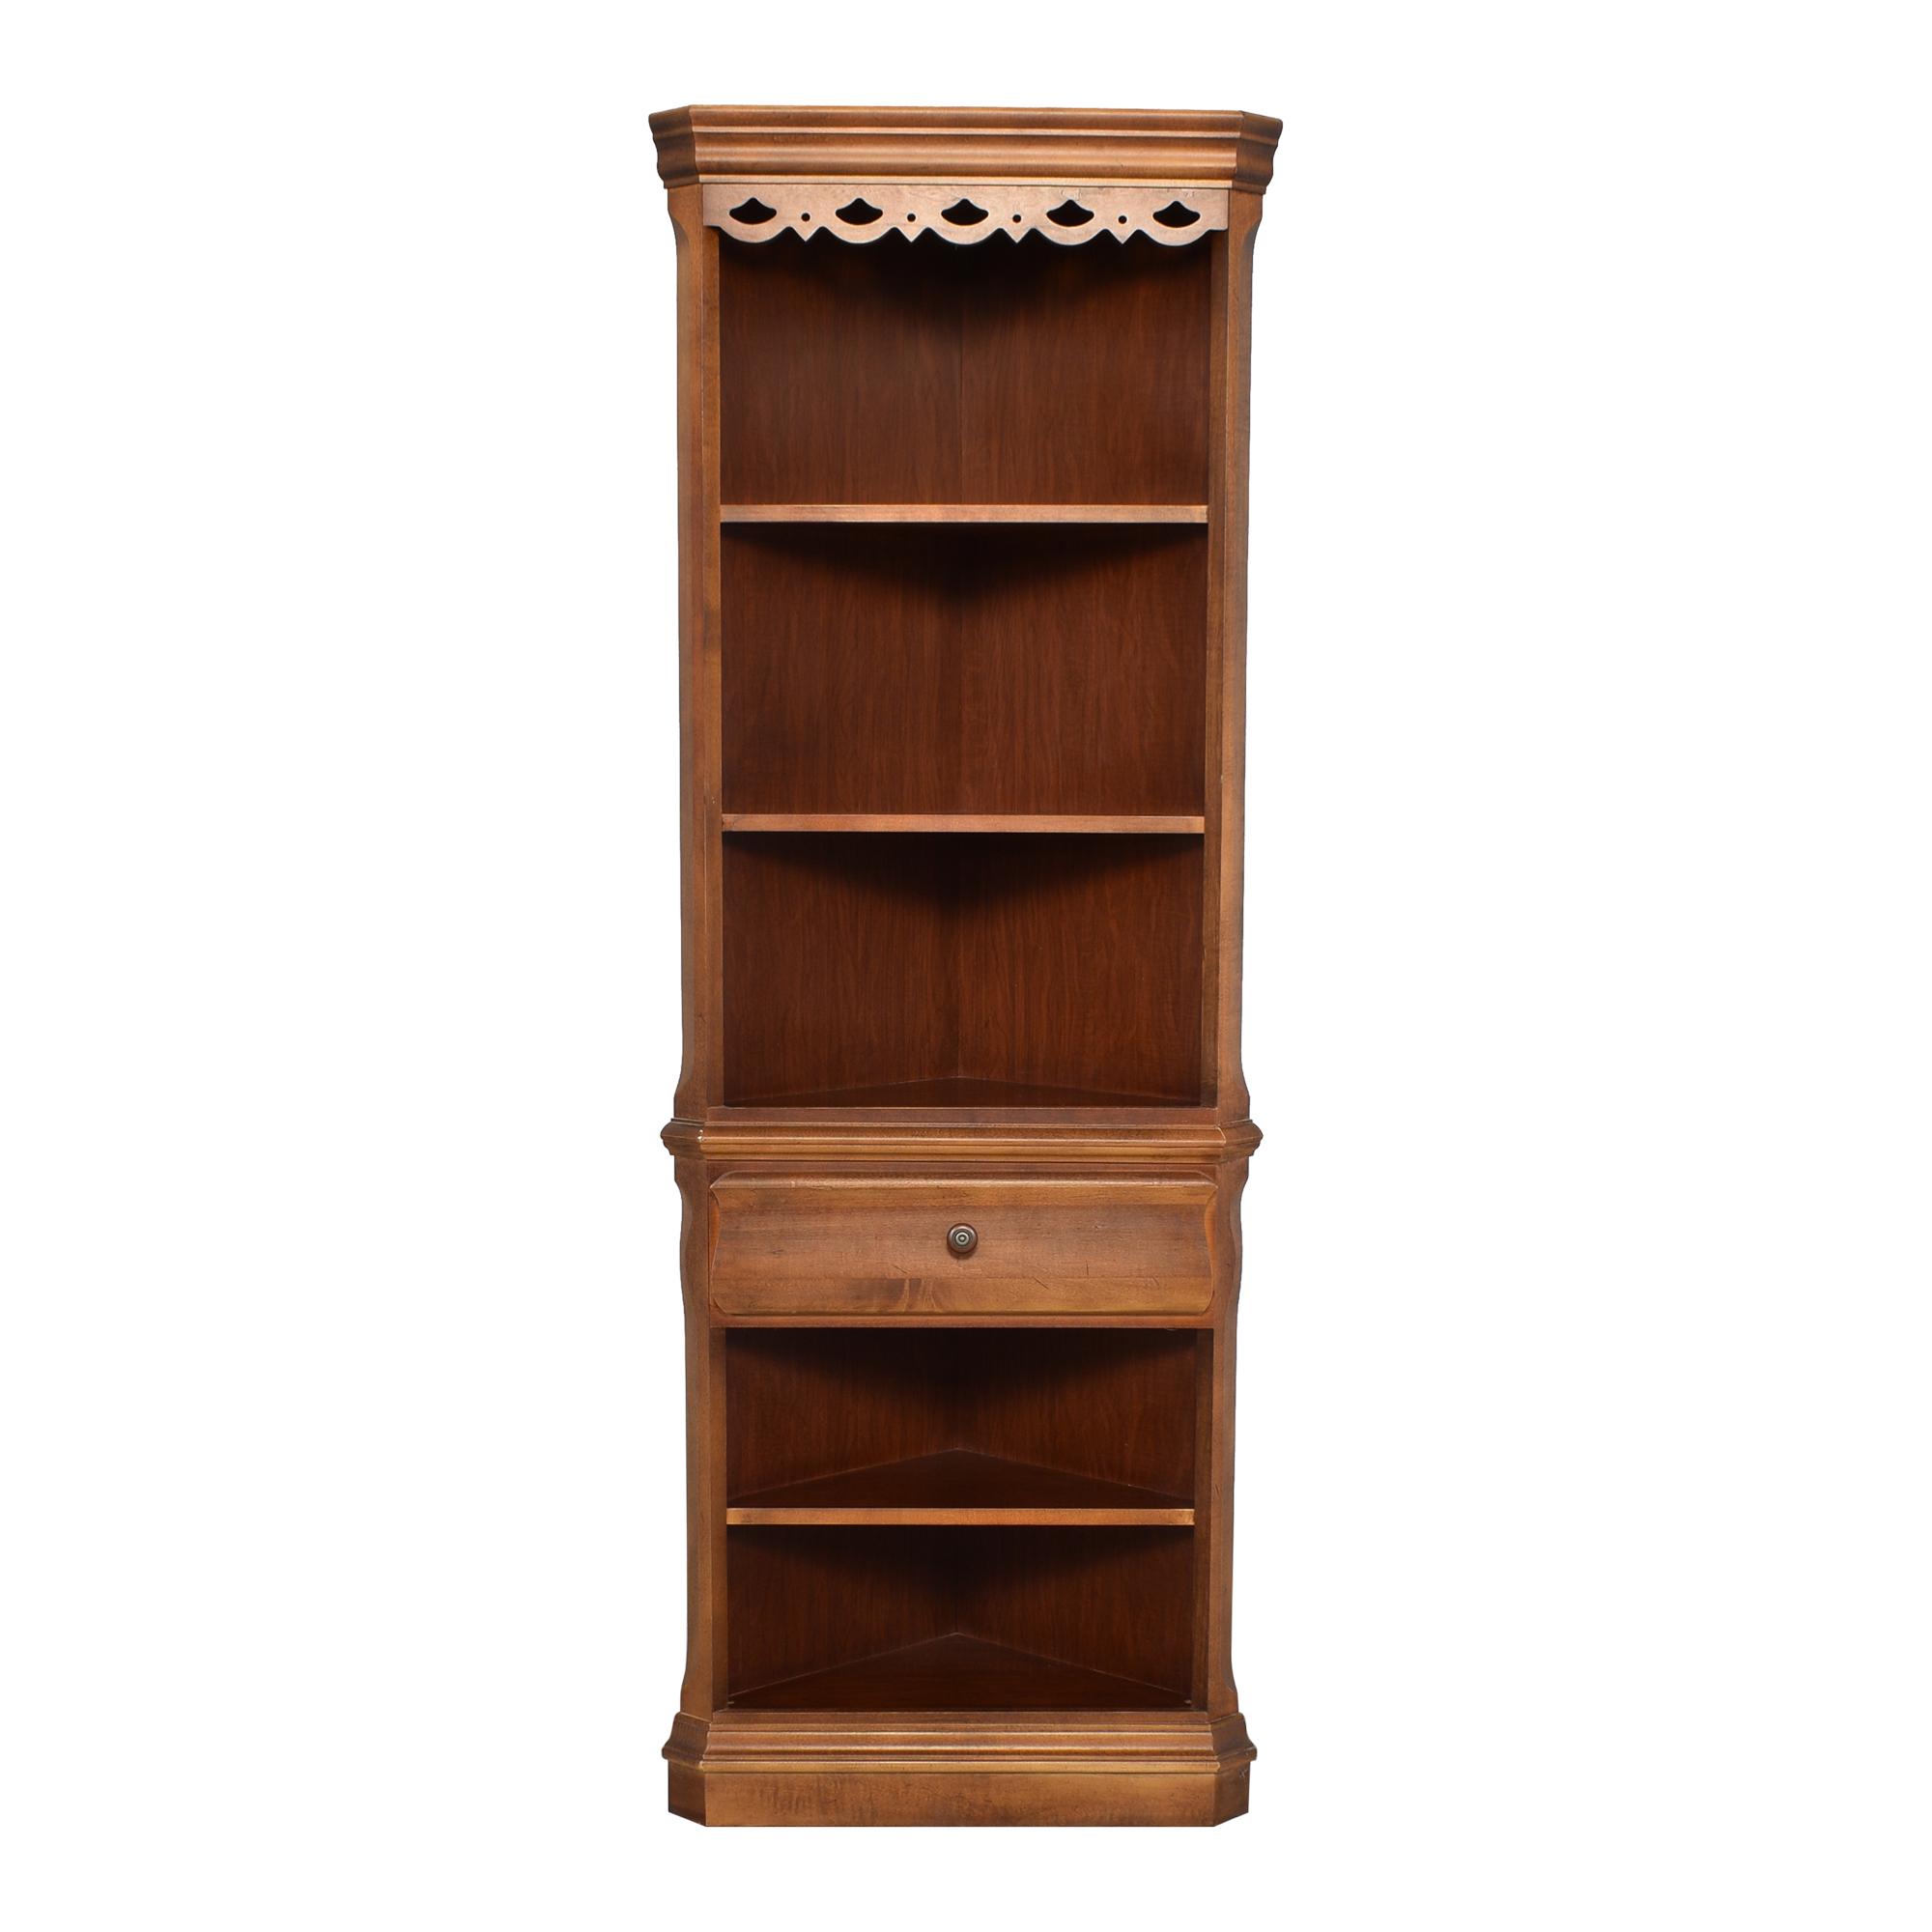 Tall Corner Bookcase / Bookcases & Shelving